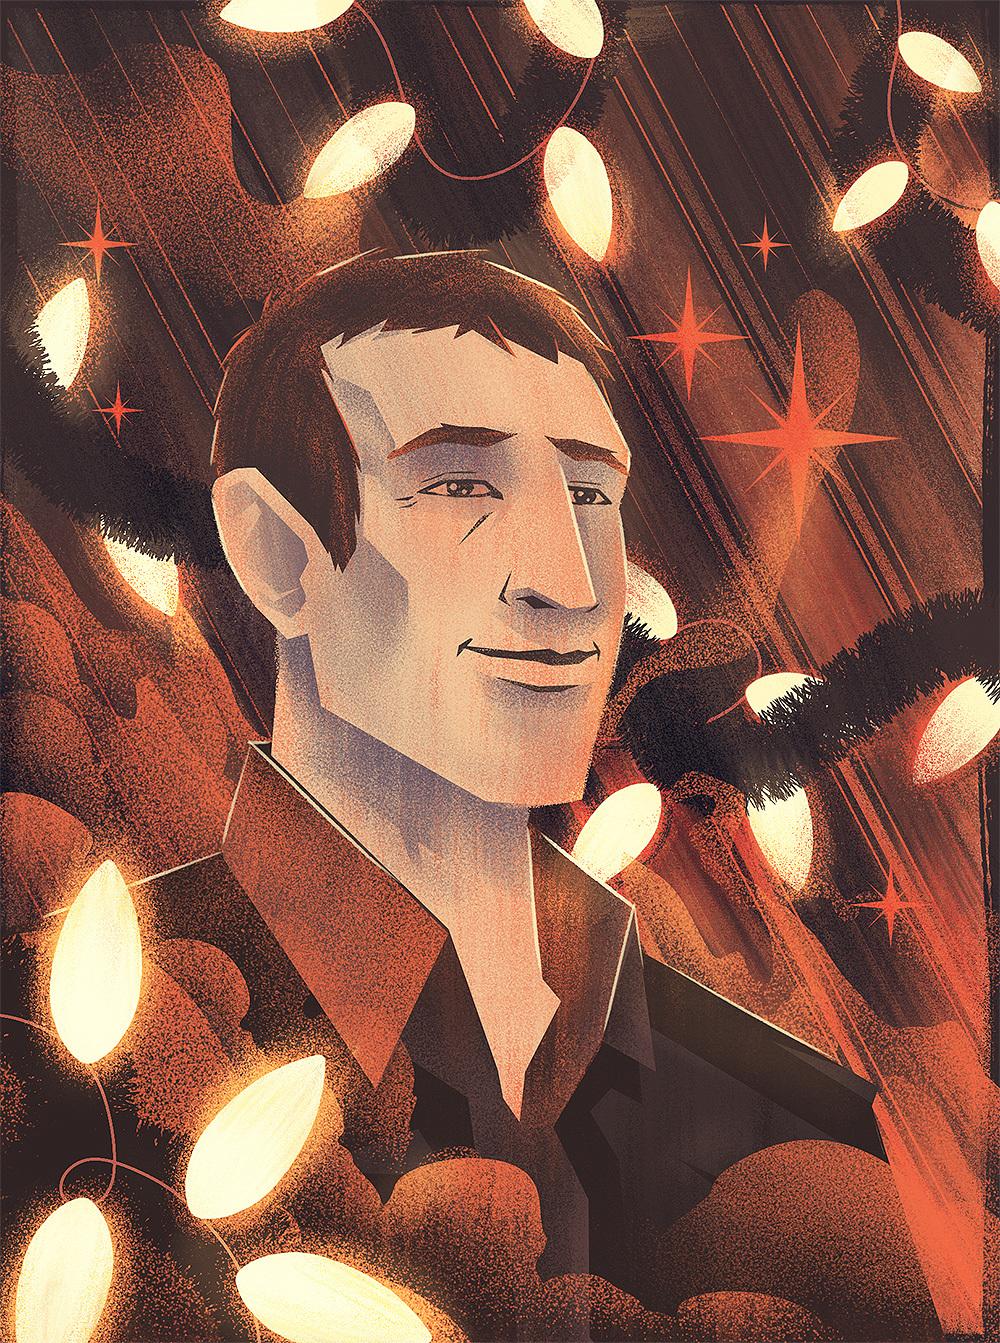 David Sedaris Portrait · Final Illustration